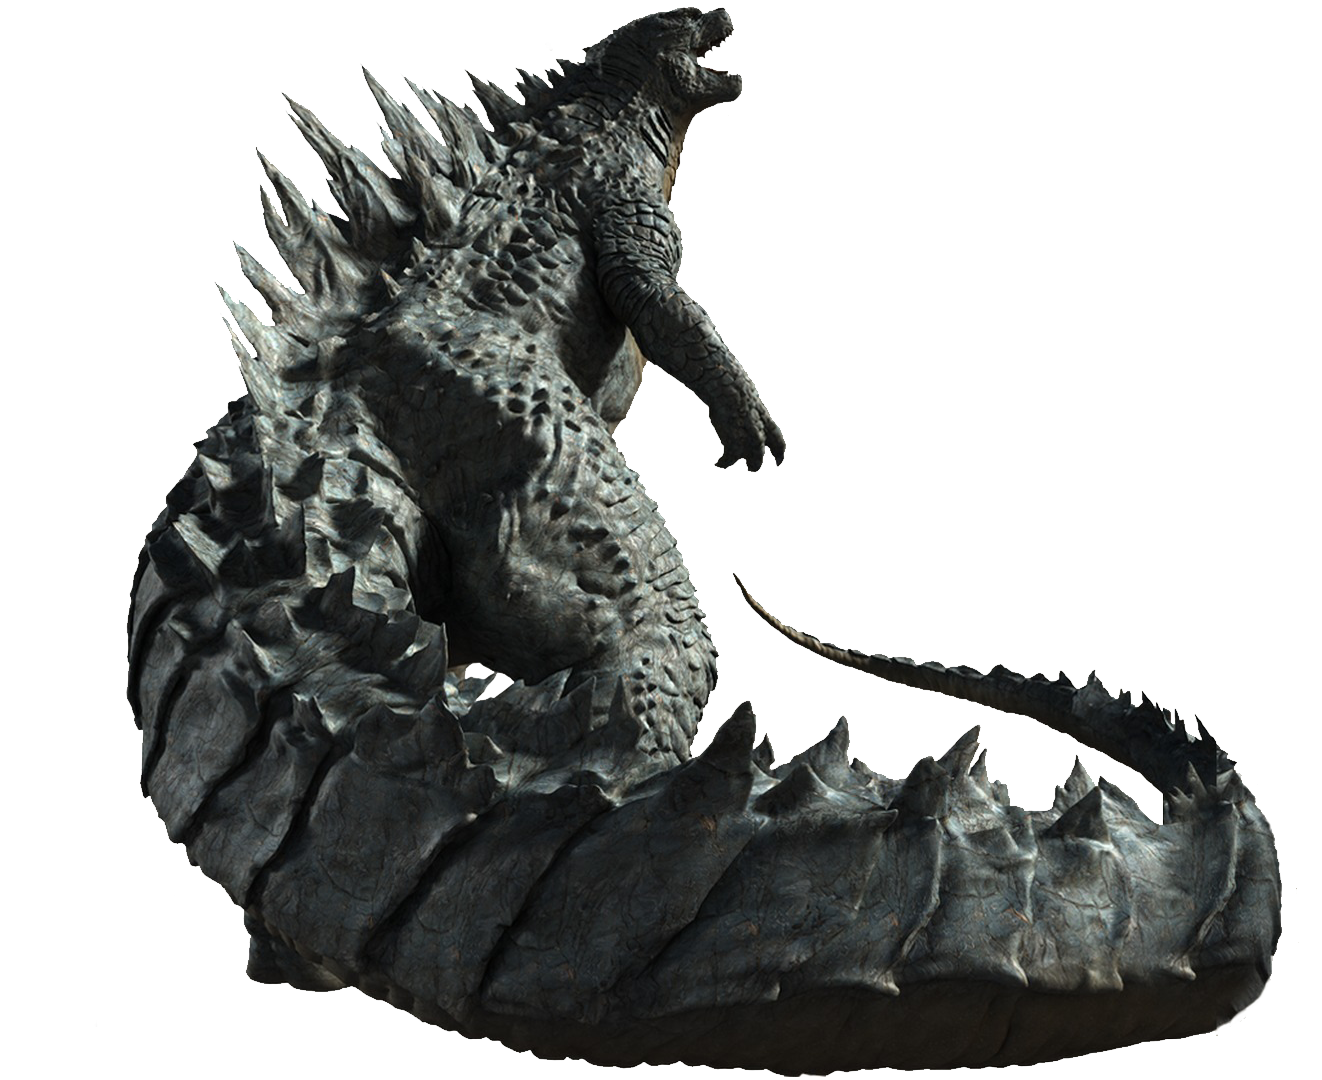 LegendaryGoji Full Body Art 2.png - Godzilla PNG HD